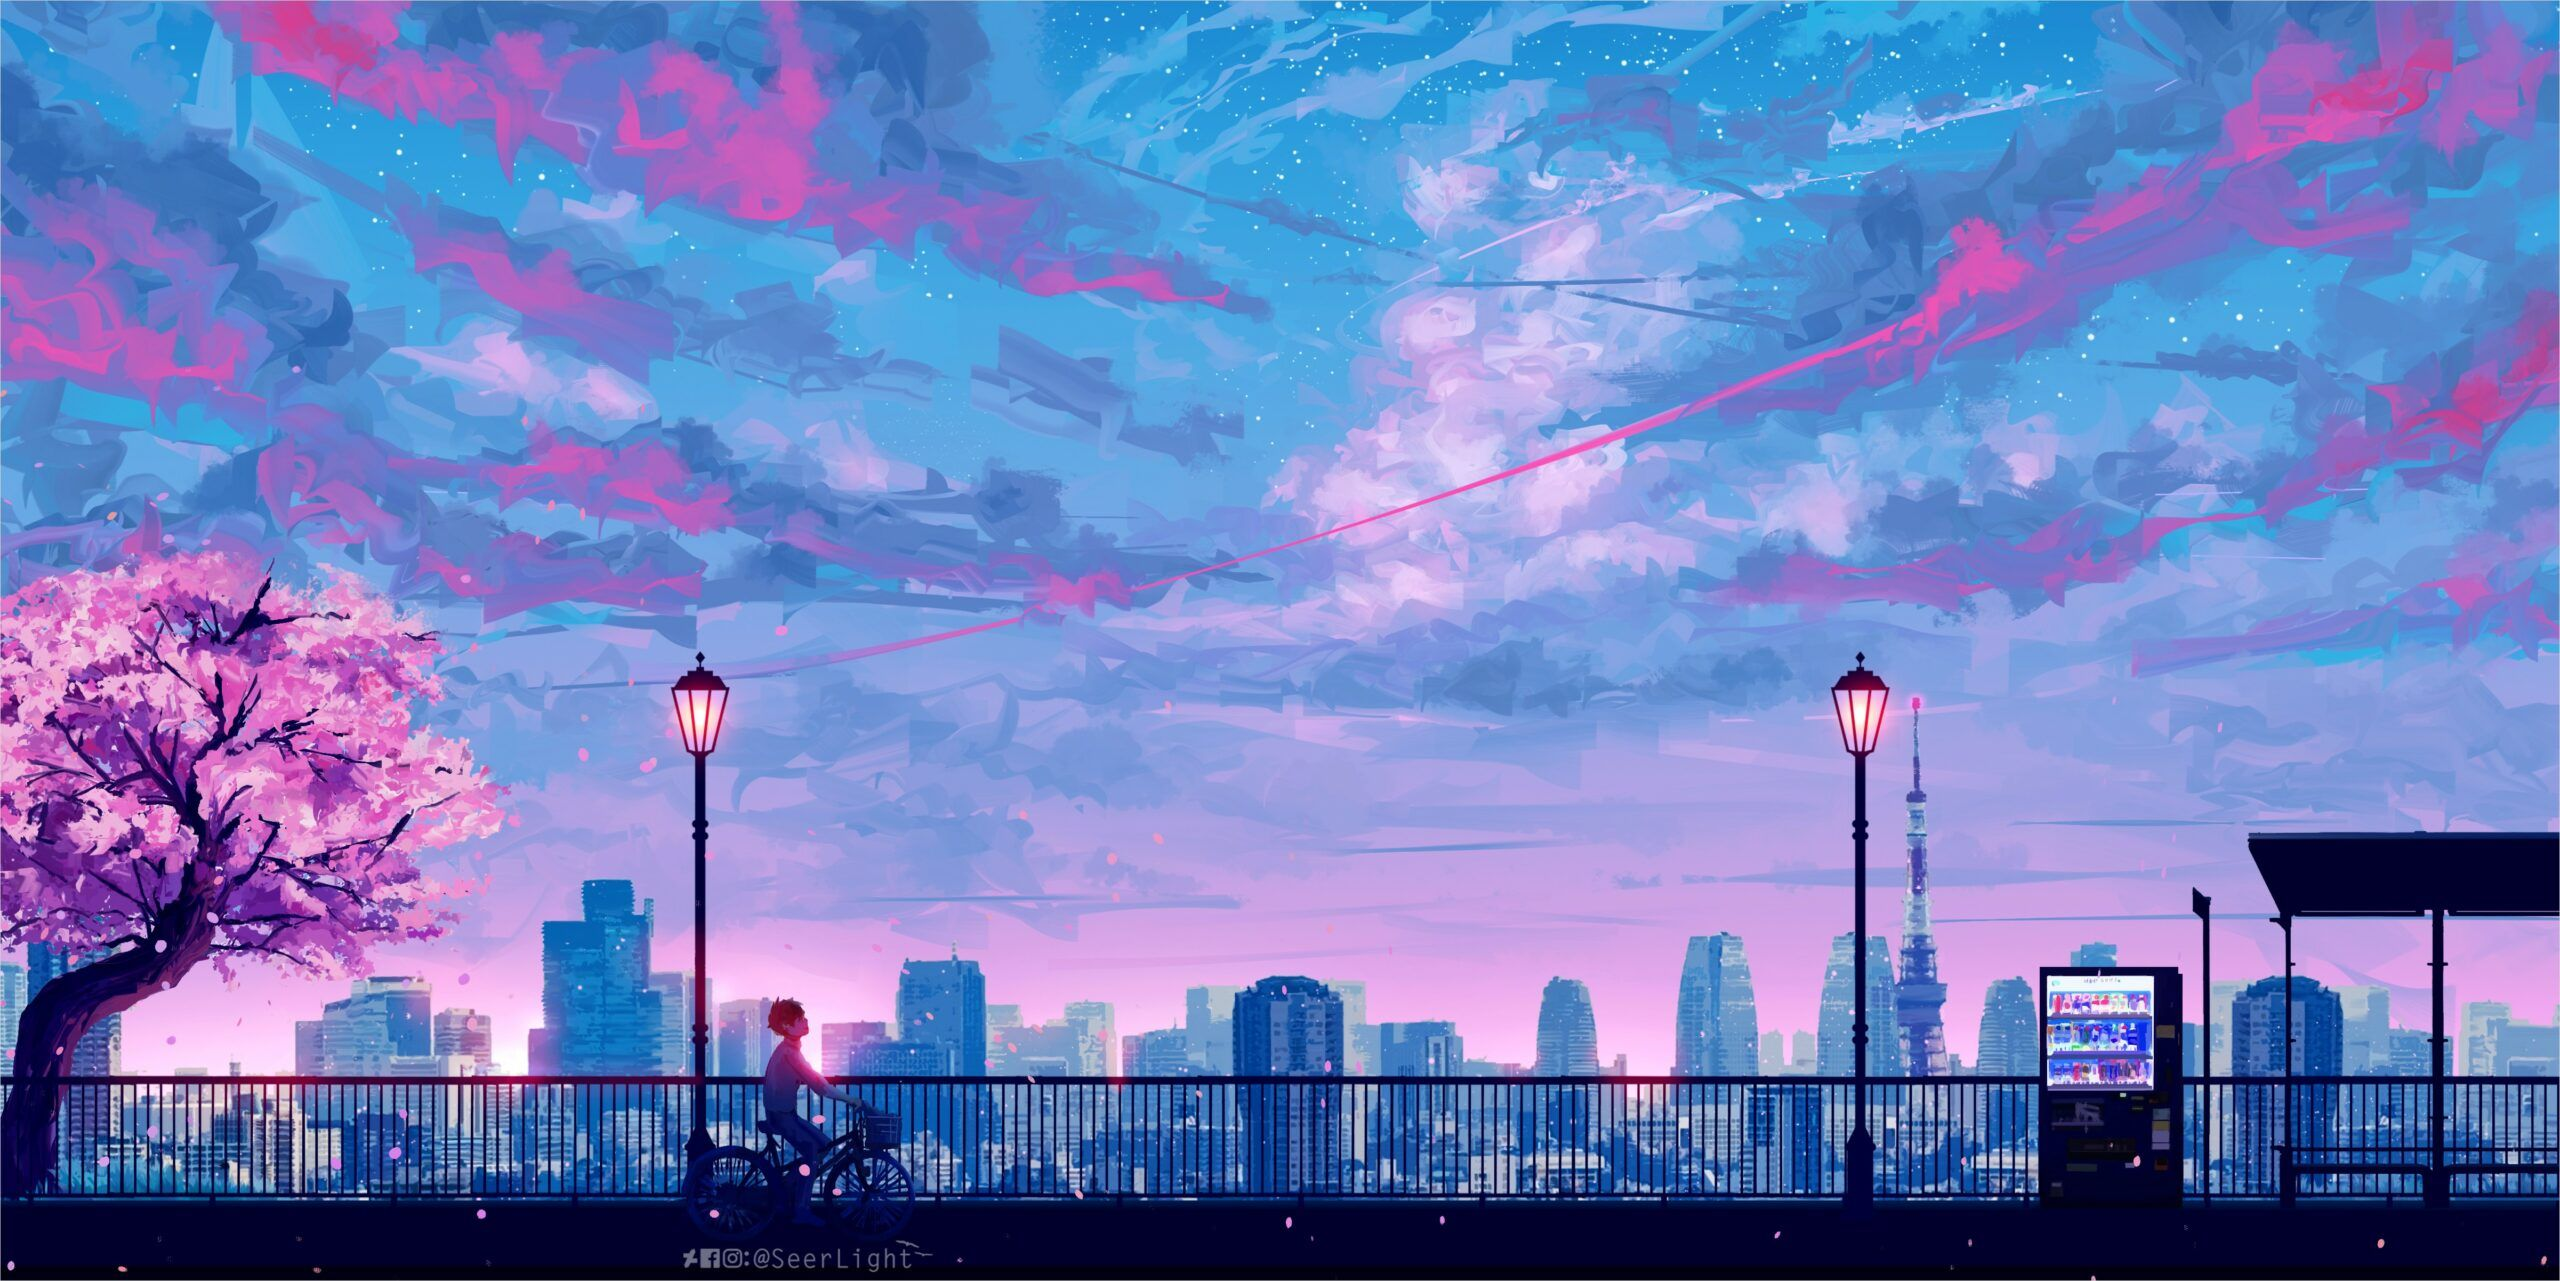 4k Anime Landscape Wallpapers In 2020 Cityscape Wallpaper Desktop Wallpaper Art Scenery Wallpaper